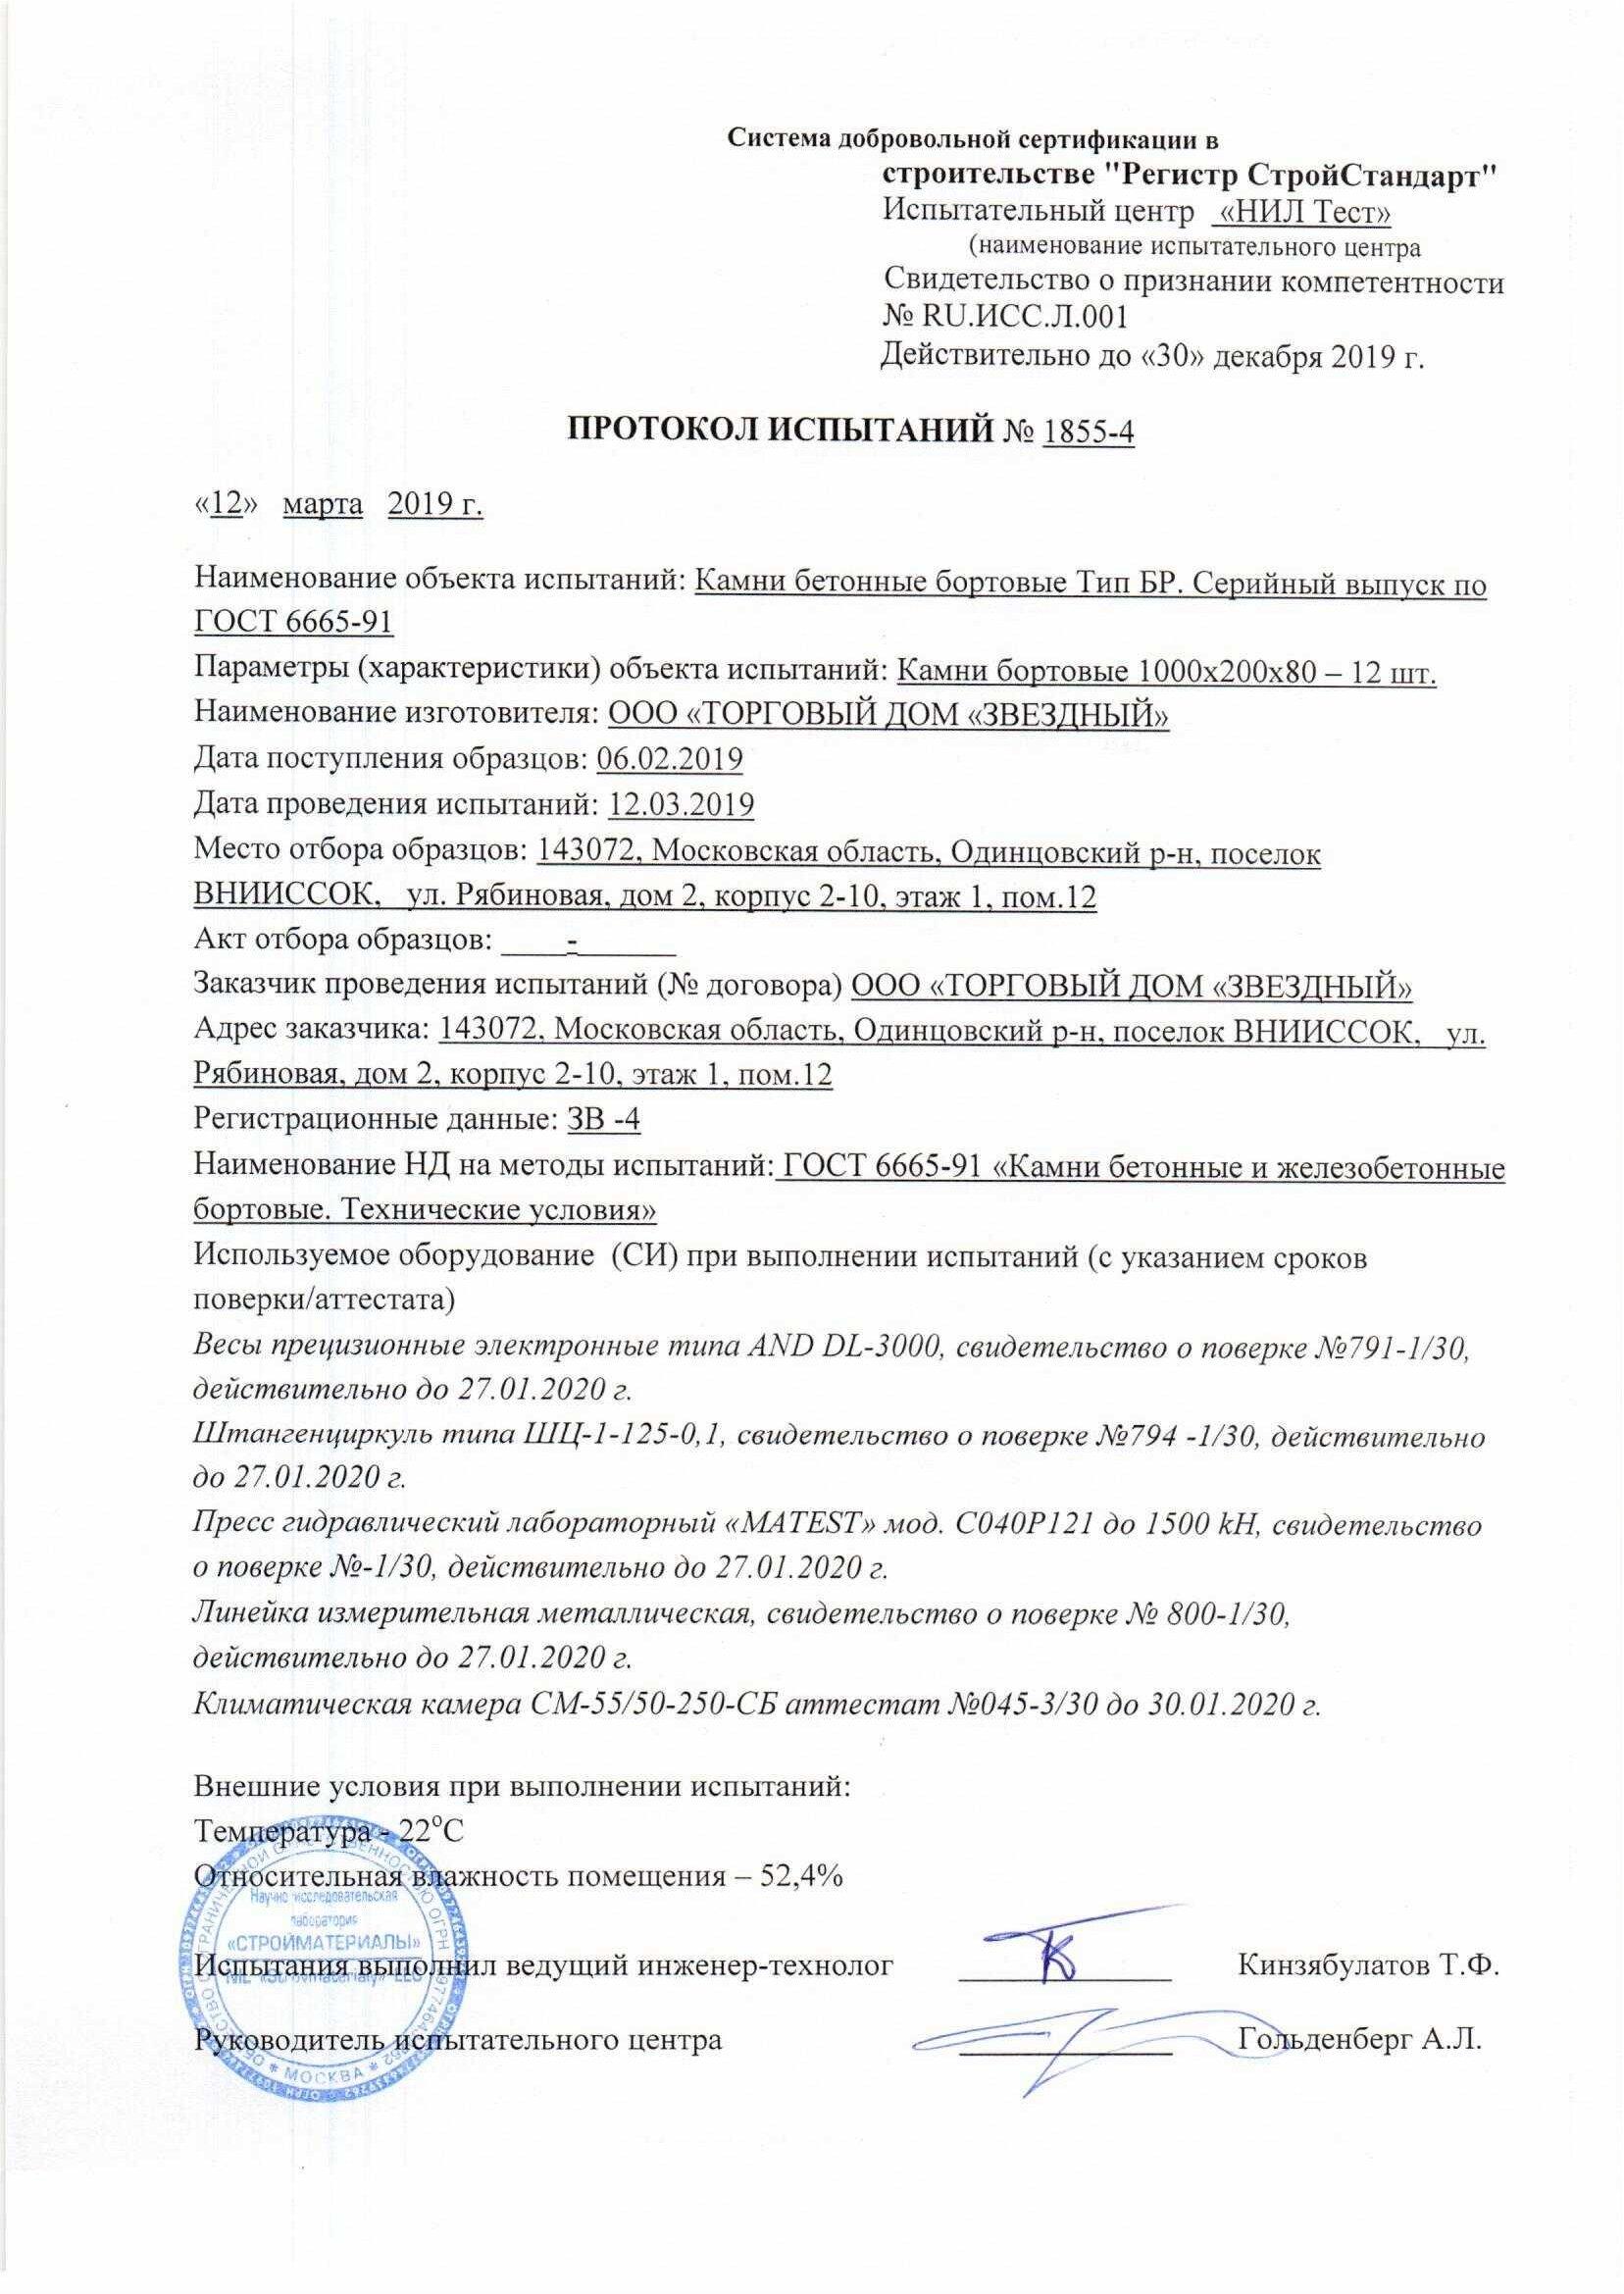 Протокол_испытаний_на_бордюр_100.20.8_8.jpg